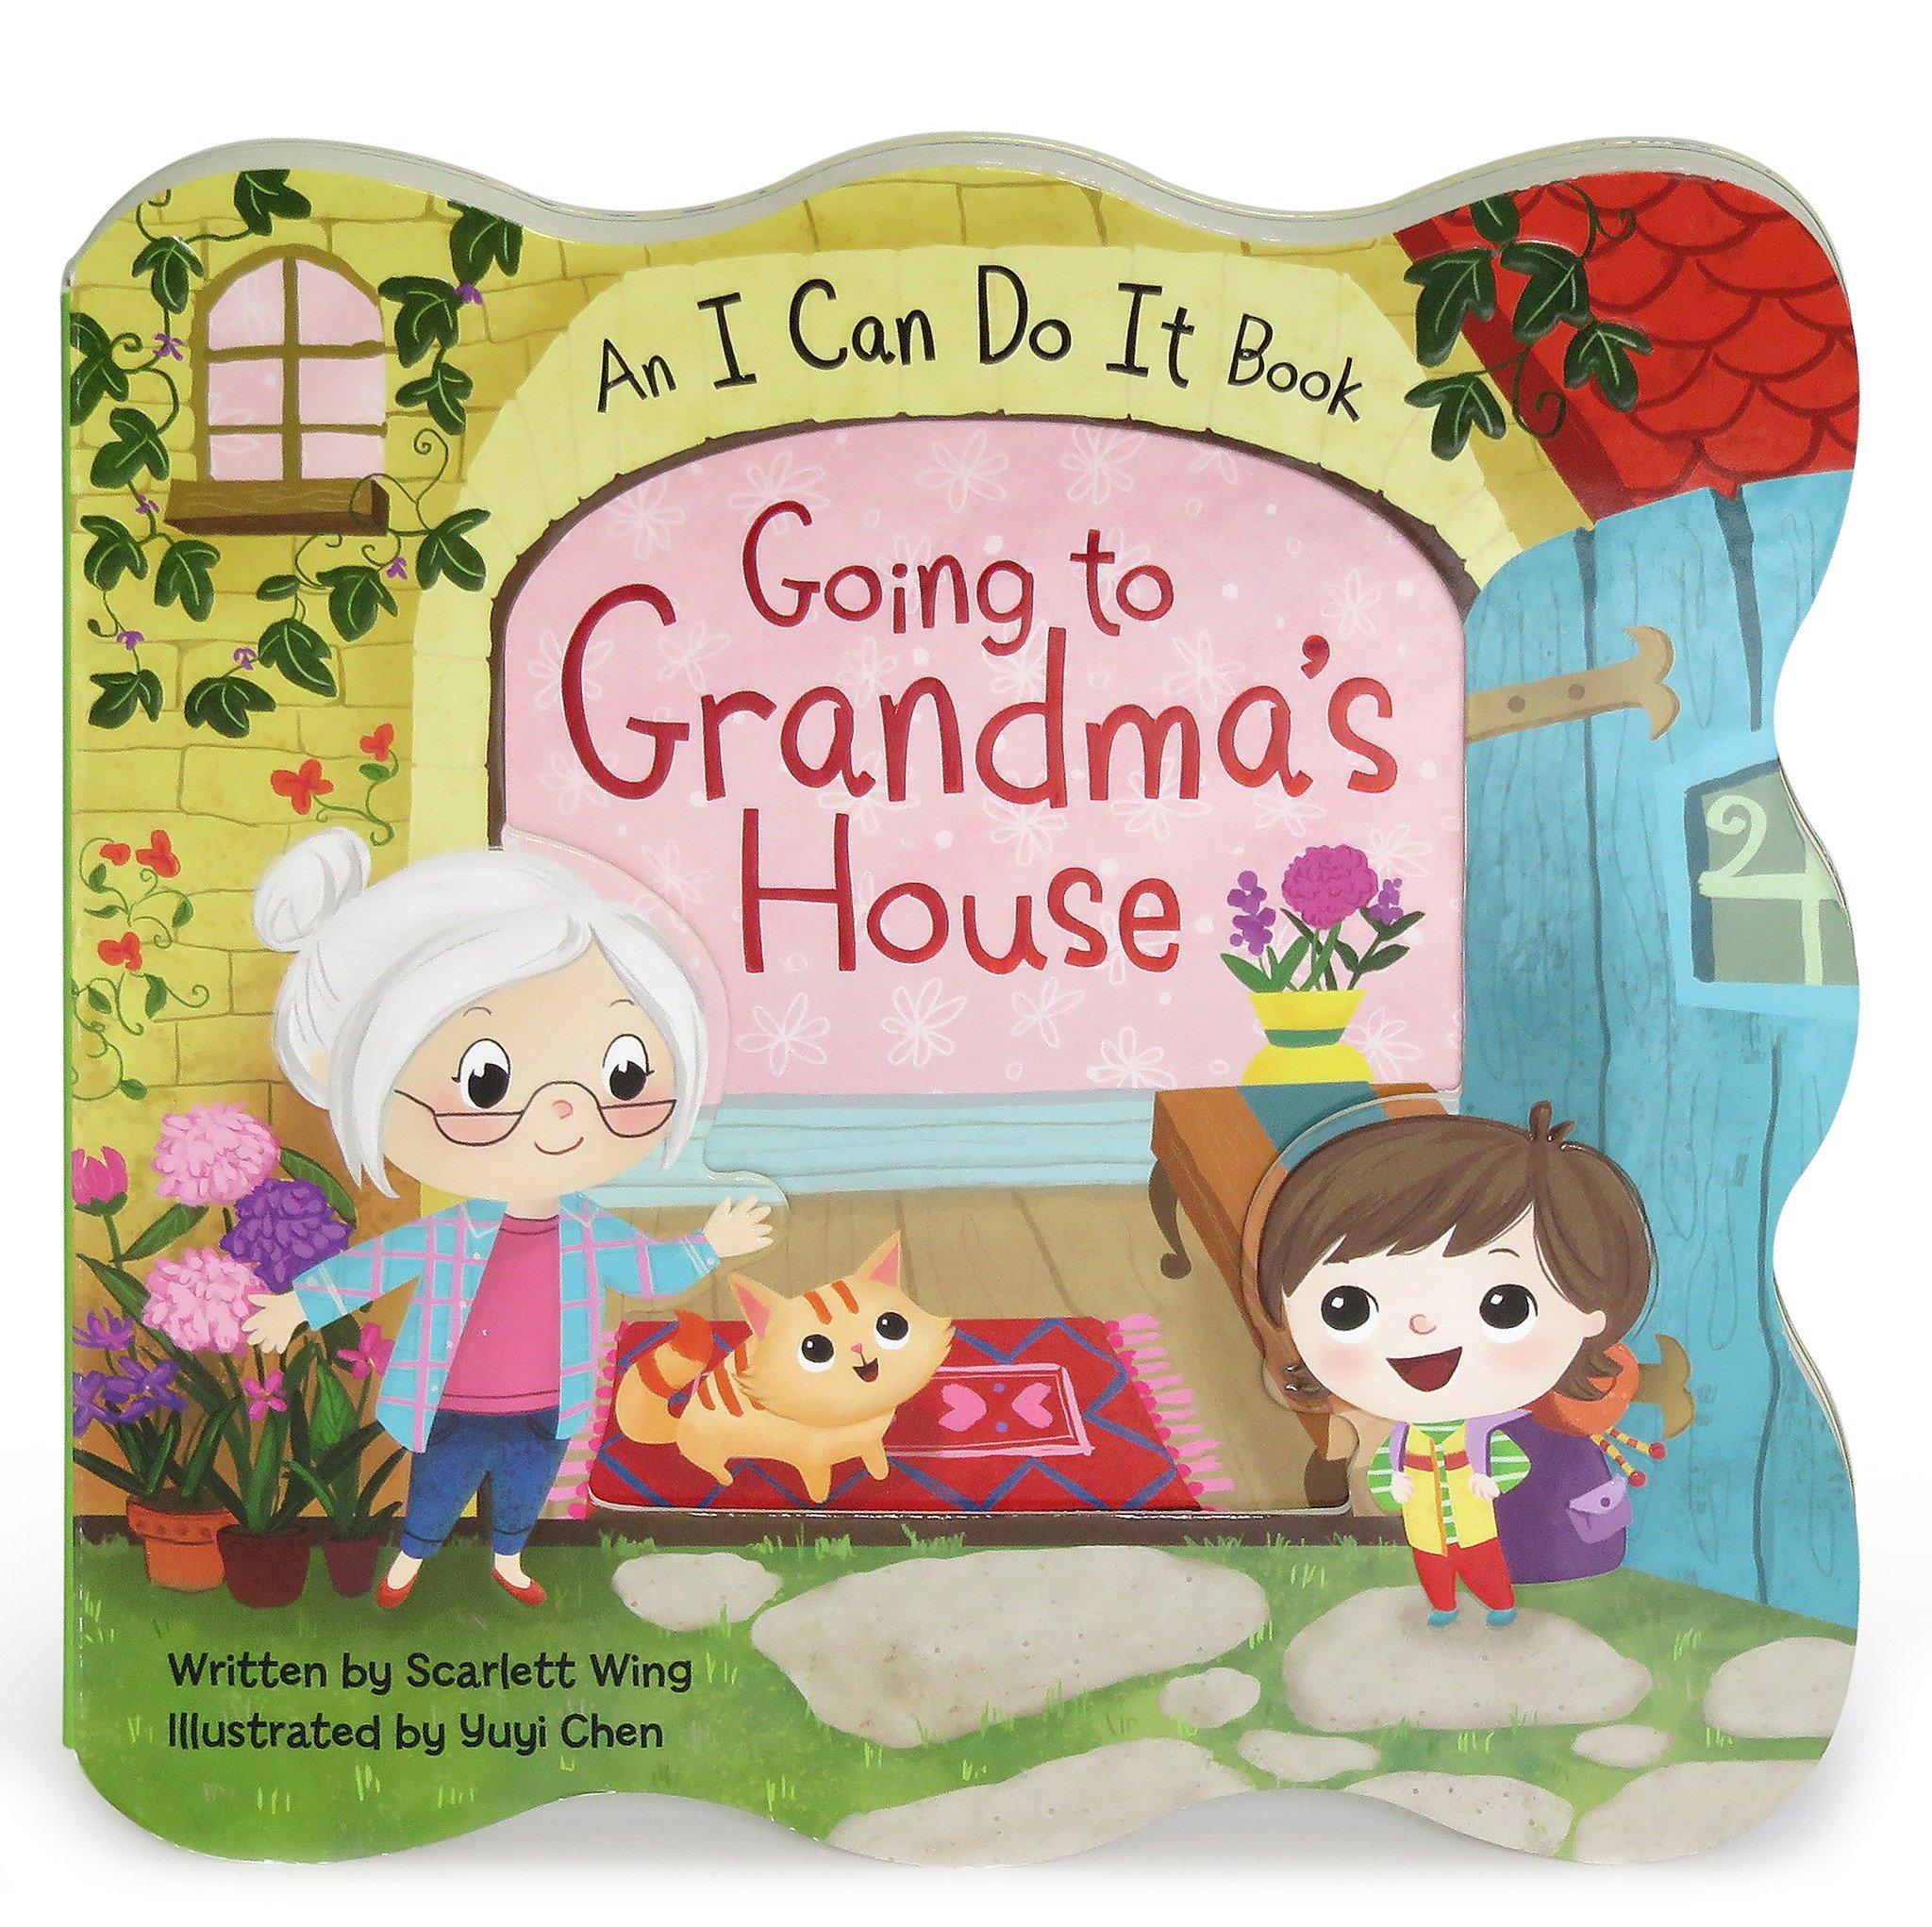 Place clipart grandma's house #15